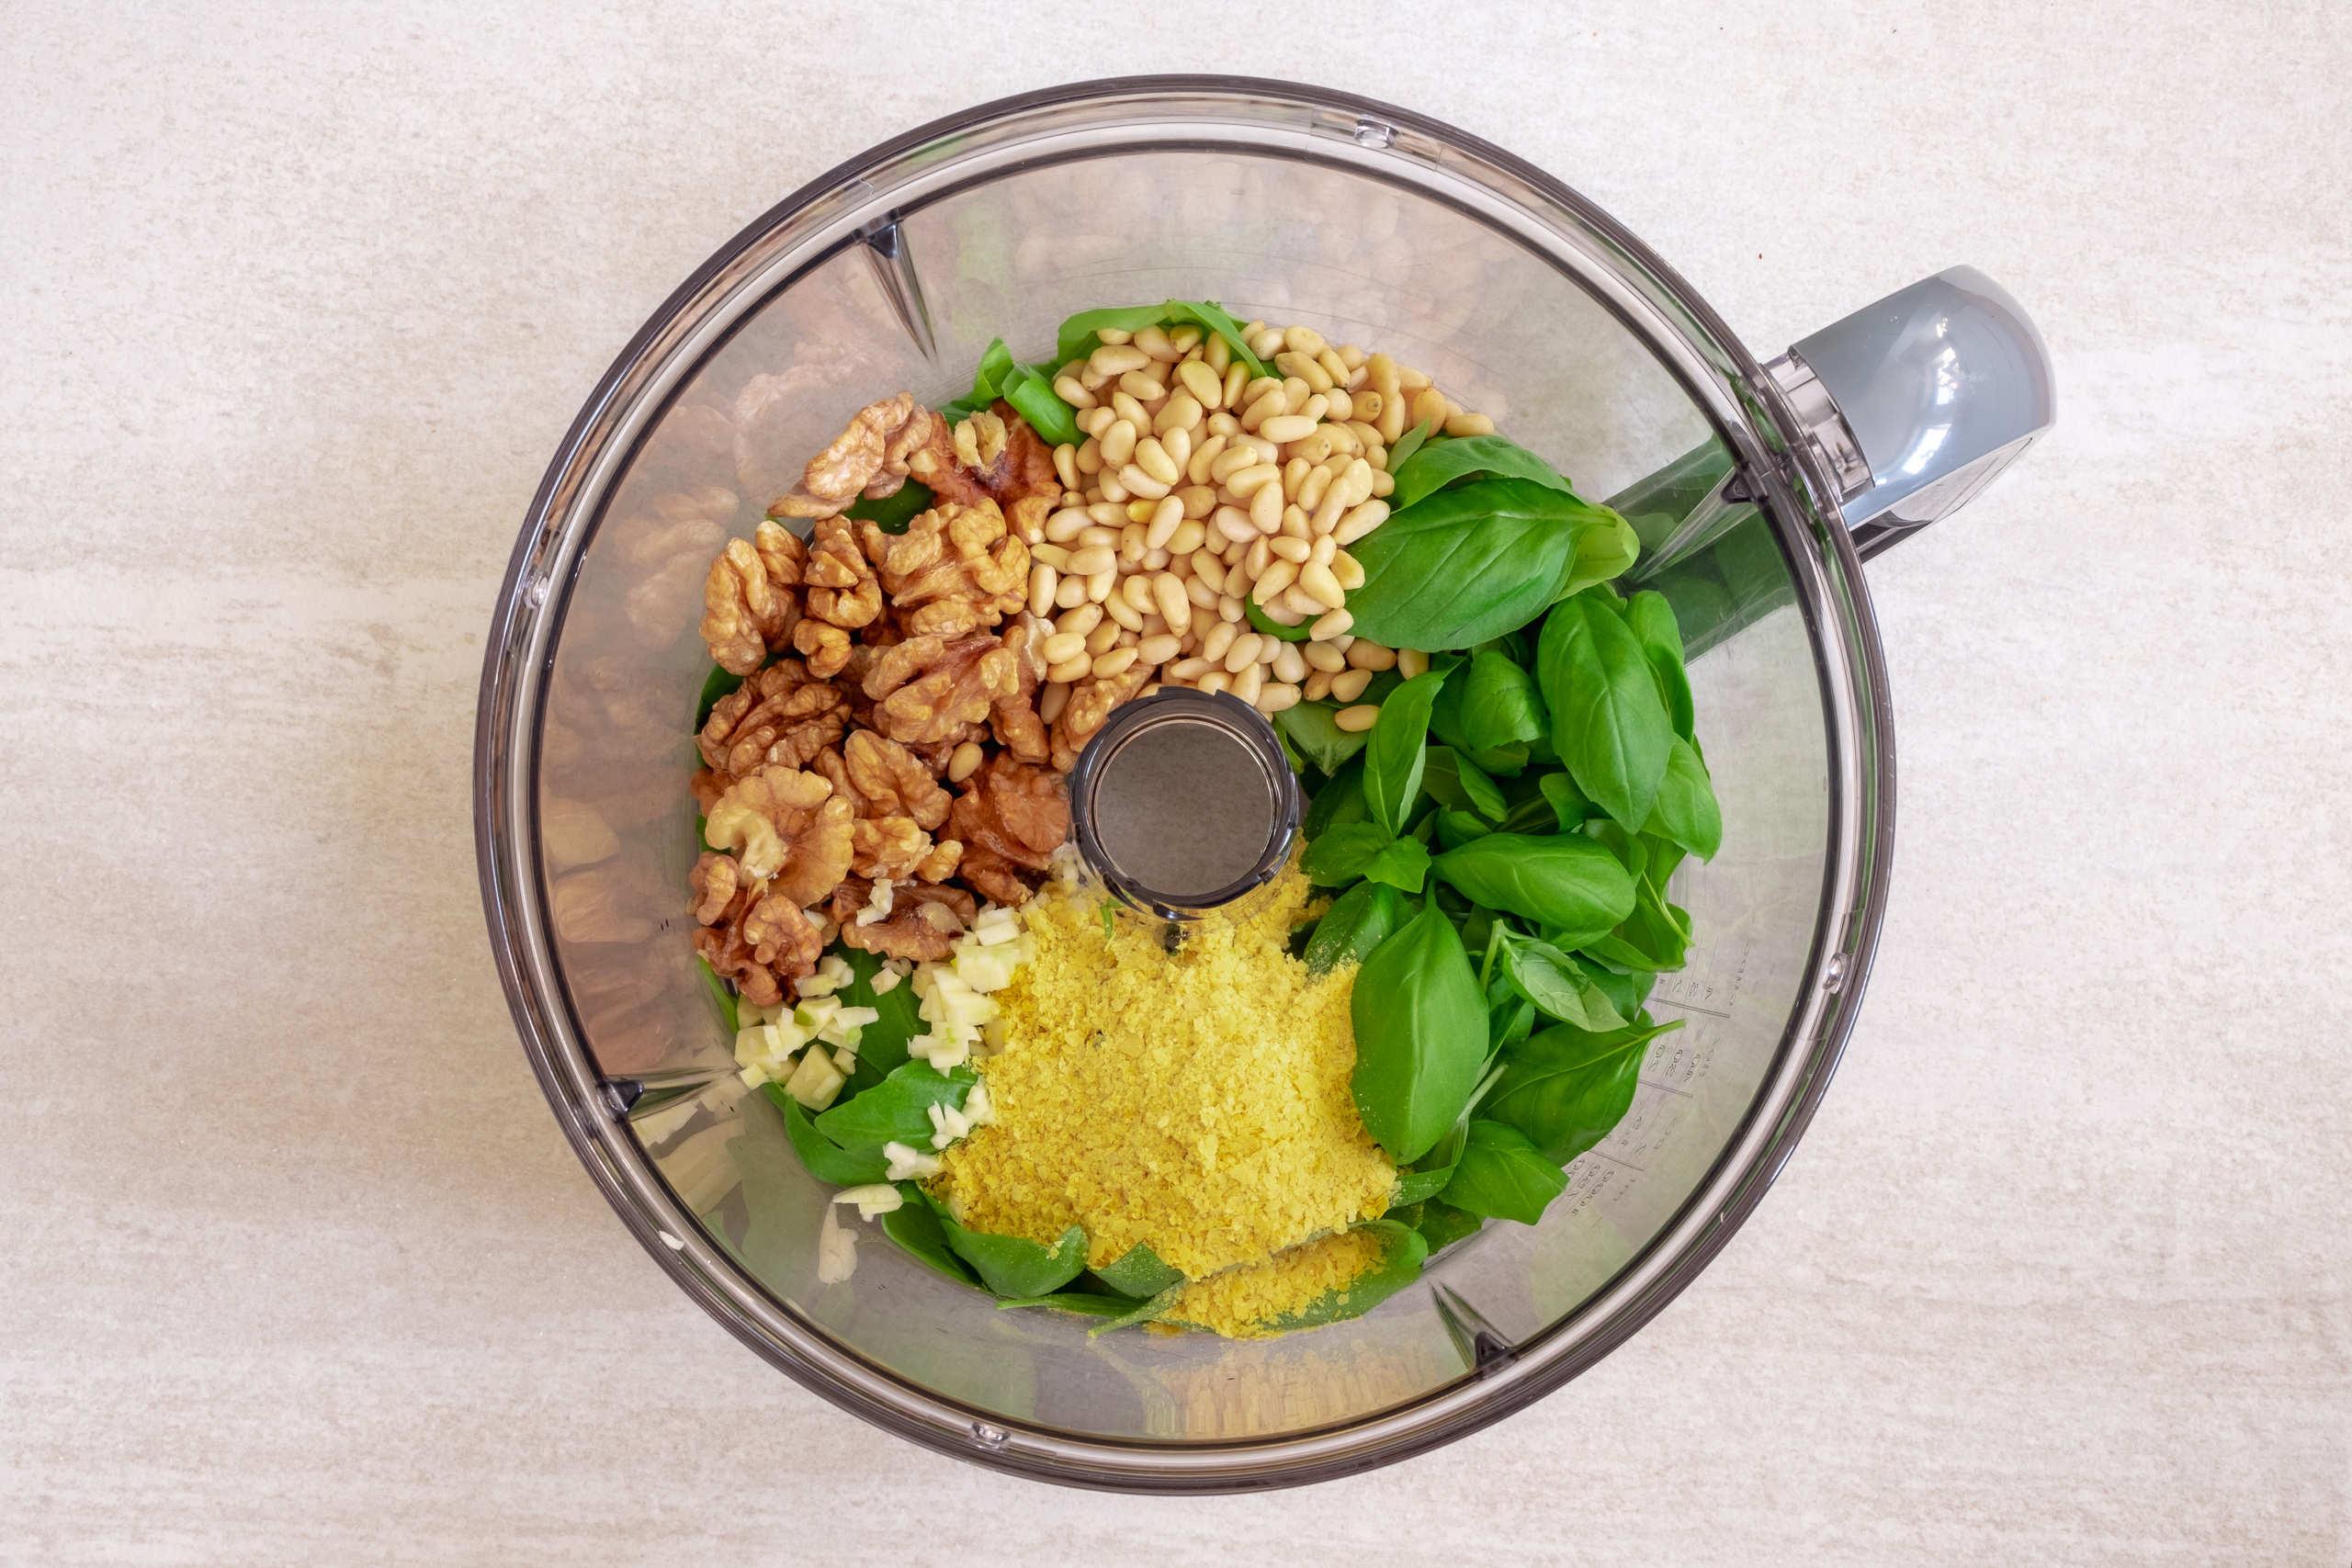 Vegan pesto with walnuts